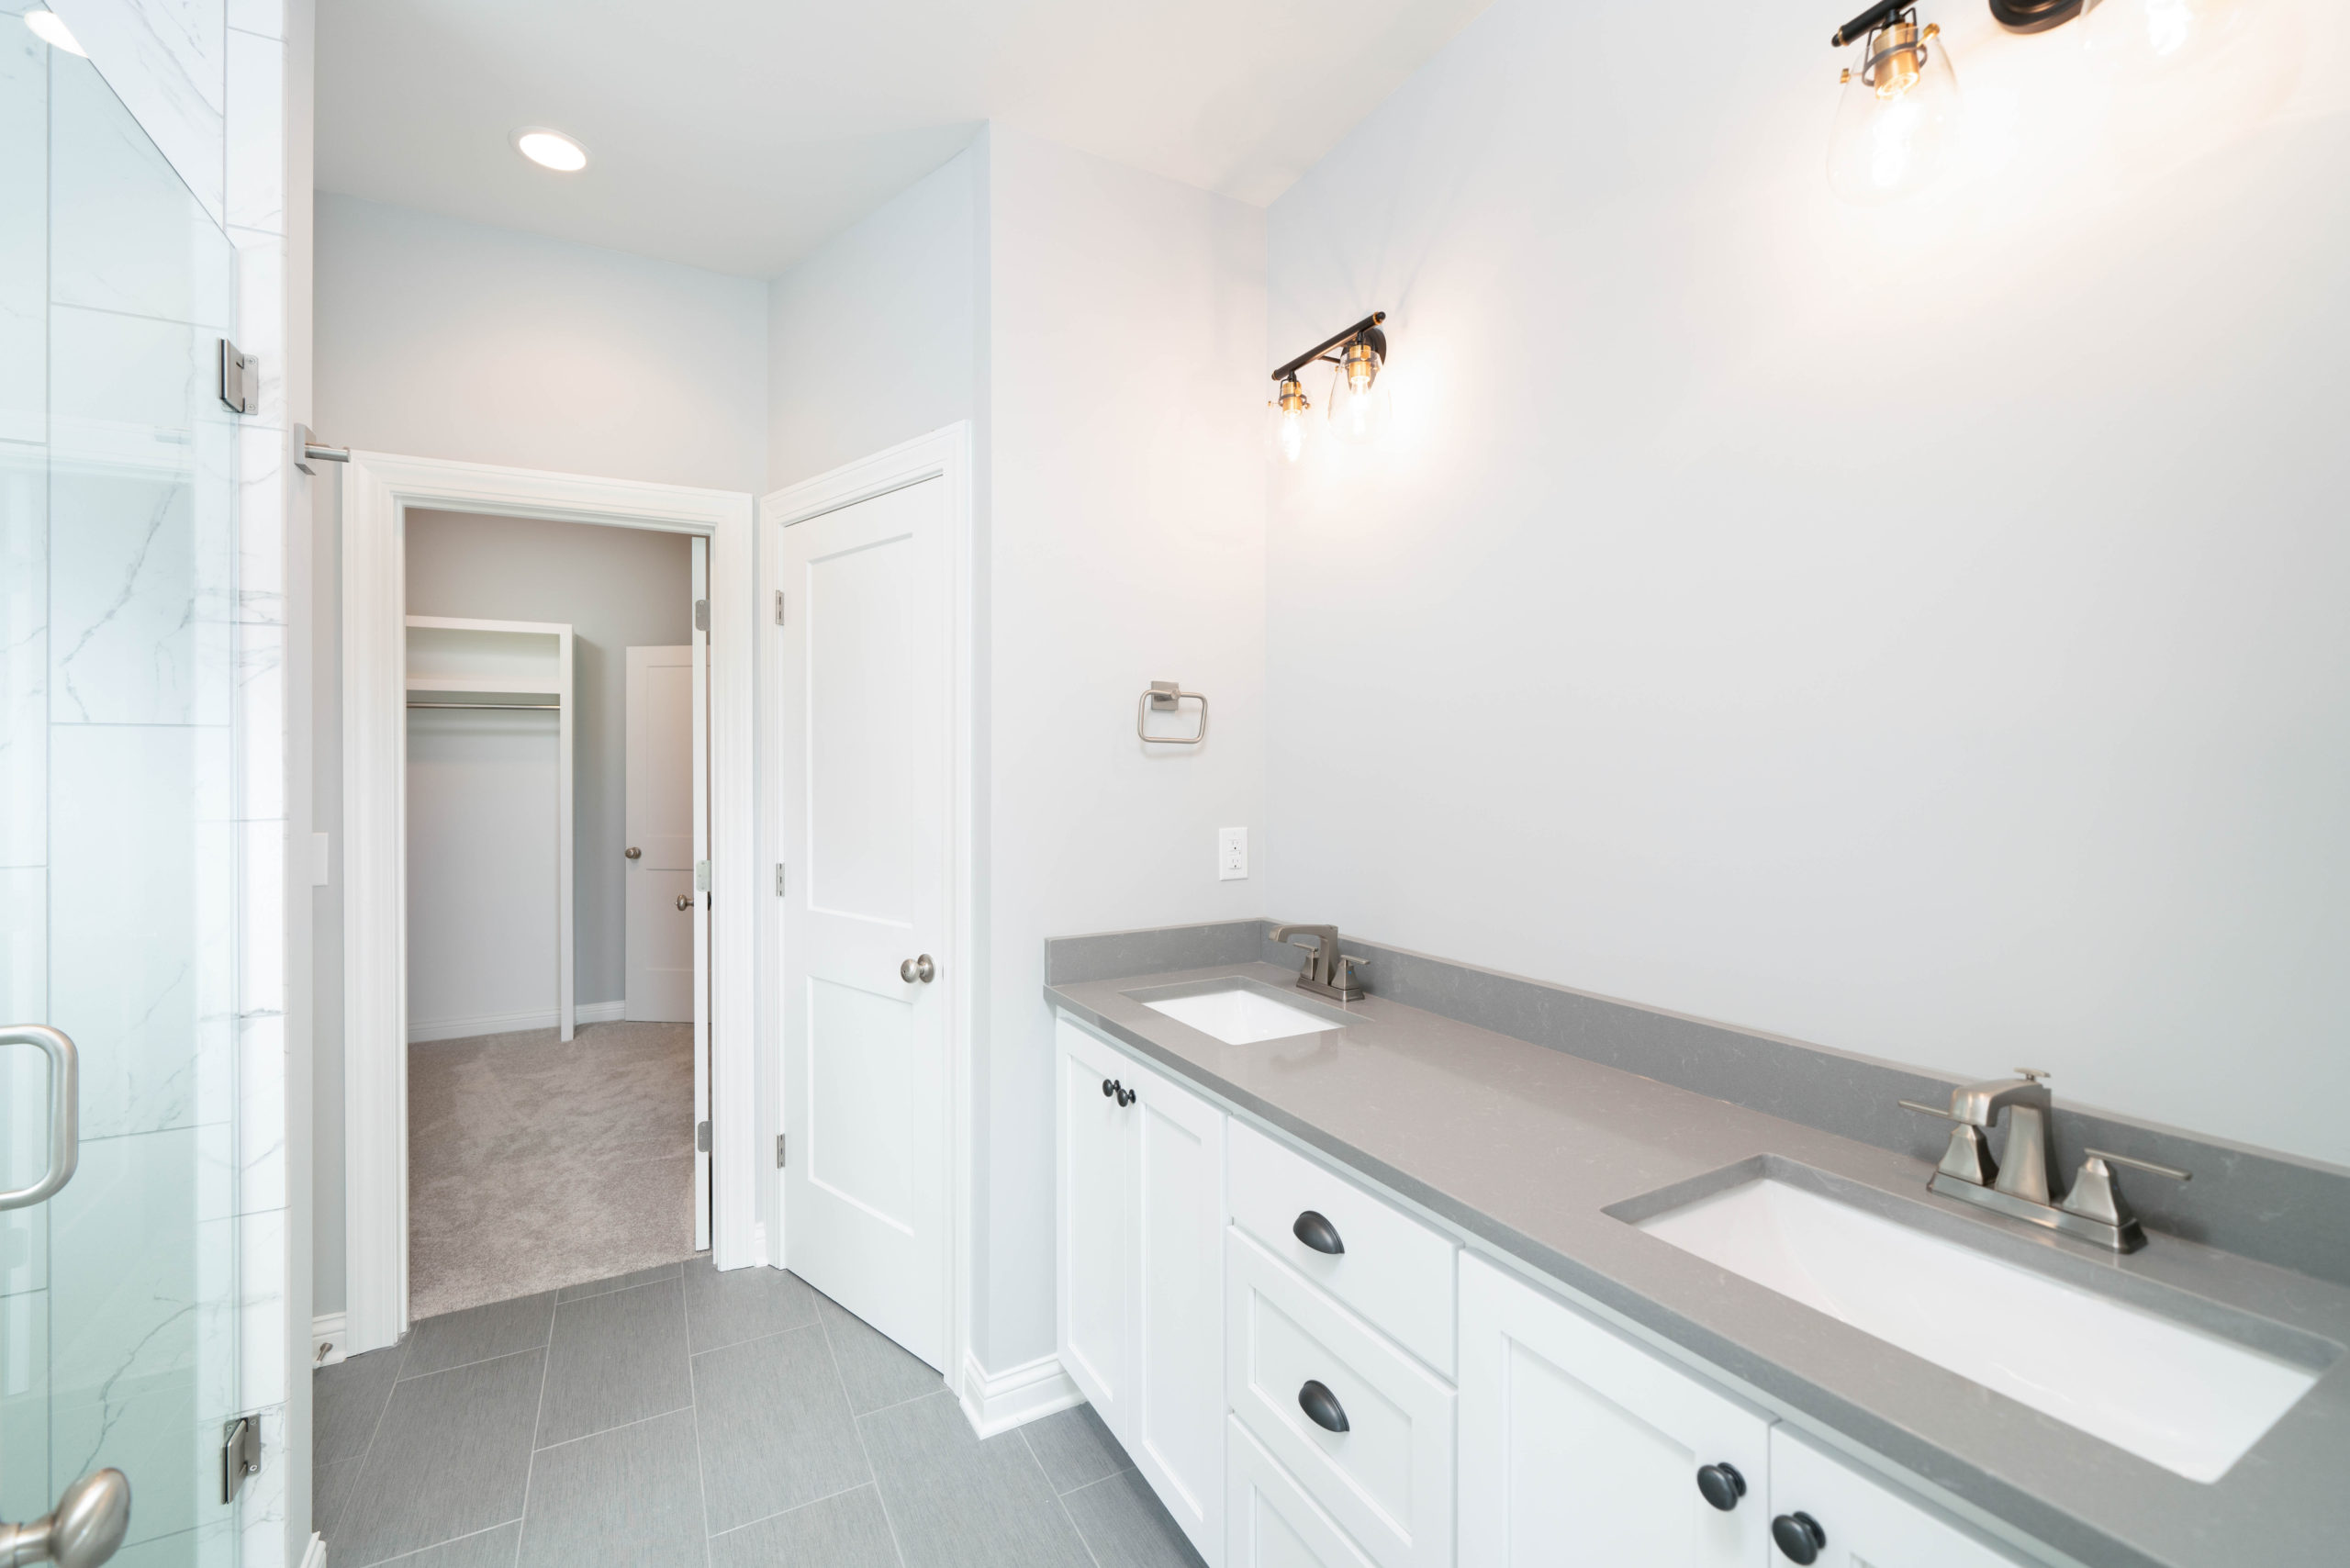 gray and white bathroom vanity